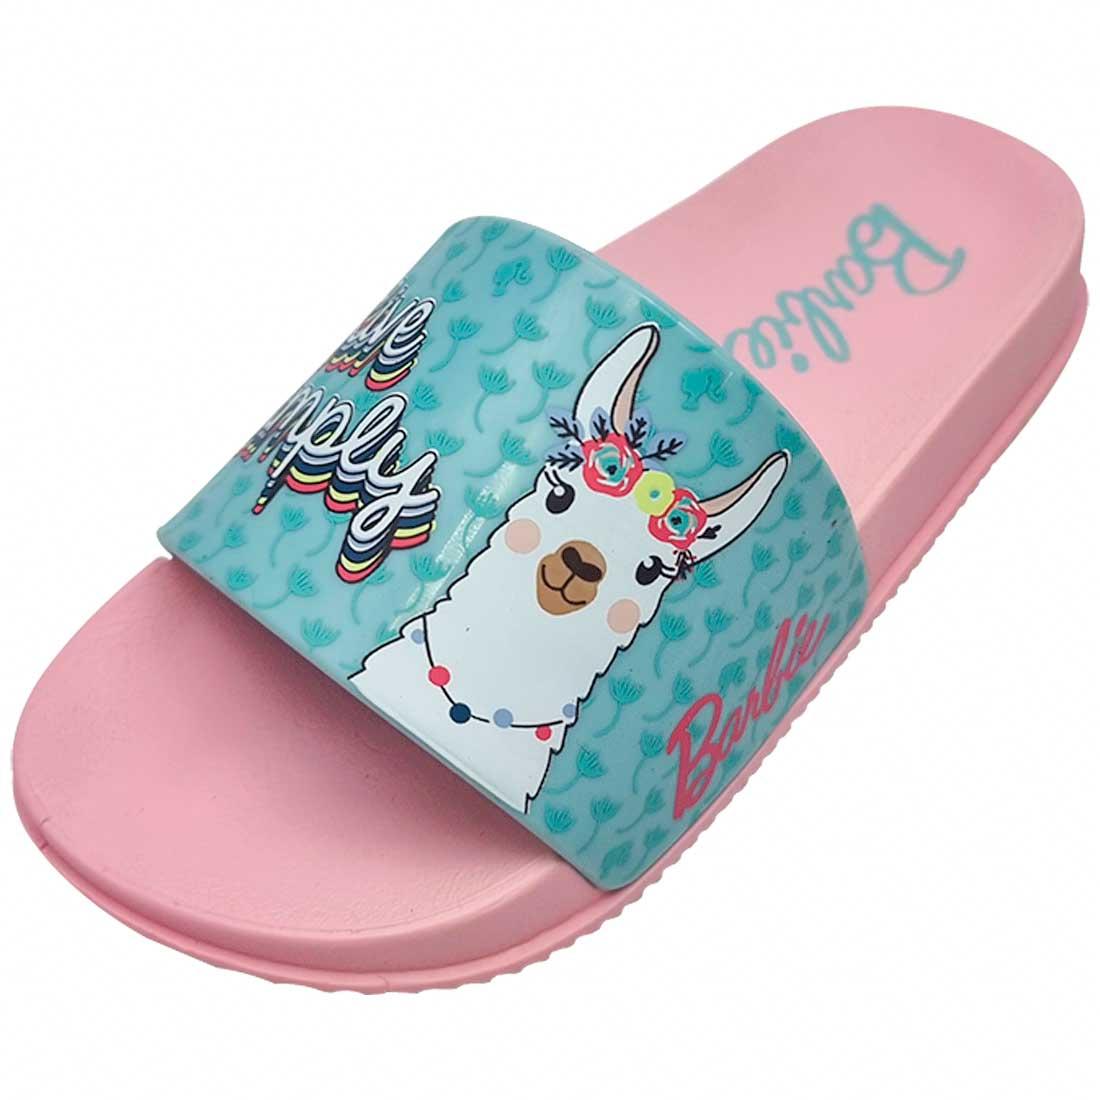 Chinelo Kids Barbie Slide Lhama - Rosa e Verde